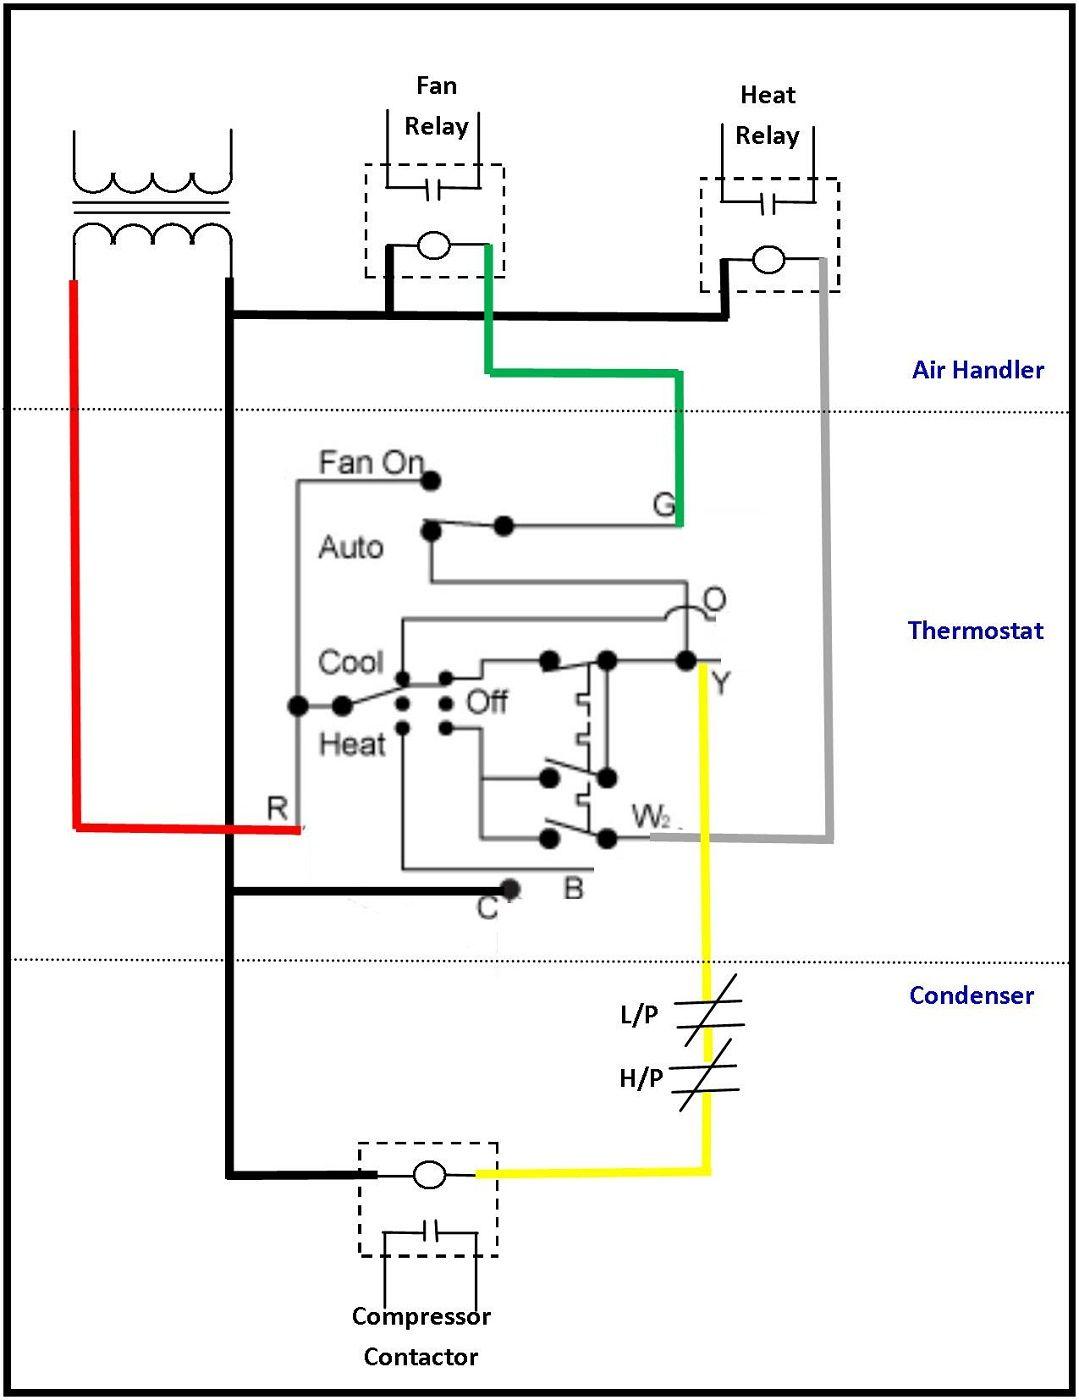 [DHAV_9290]  38 Stunning Aoa Network Diagram Generator For You ,  https://bacamajalah.com/38-stunning-… | Electrical wiring diagram,  Thermostat wiring, Electrical circuit diagram | Ac House Wiring Diagram |  | Pinterest